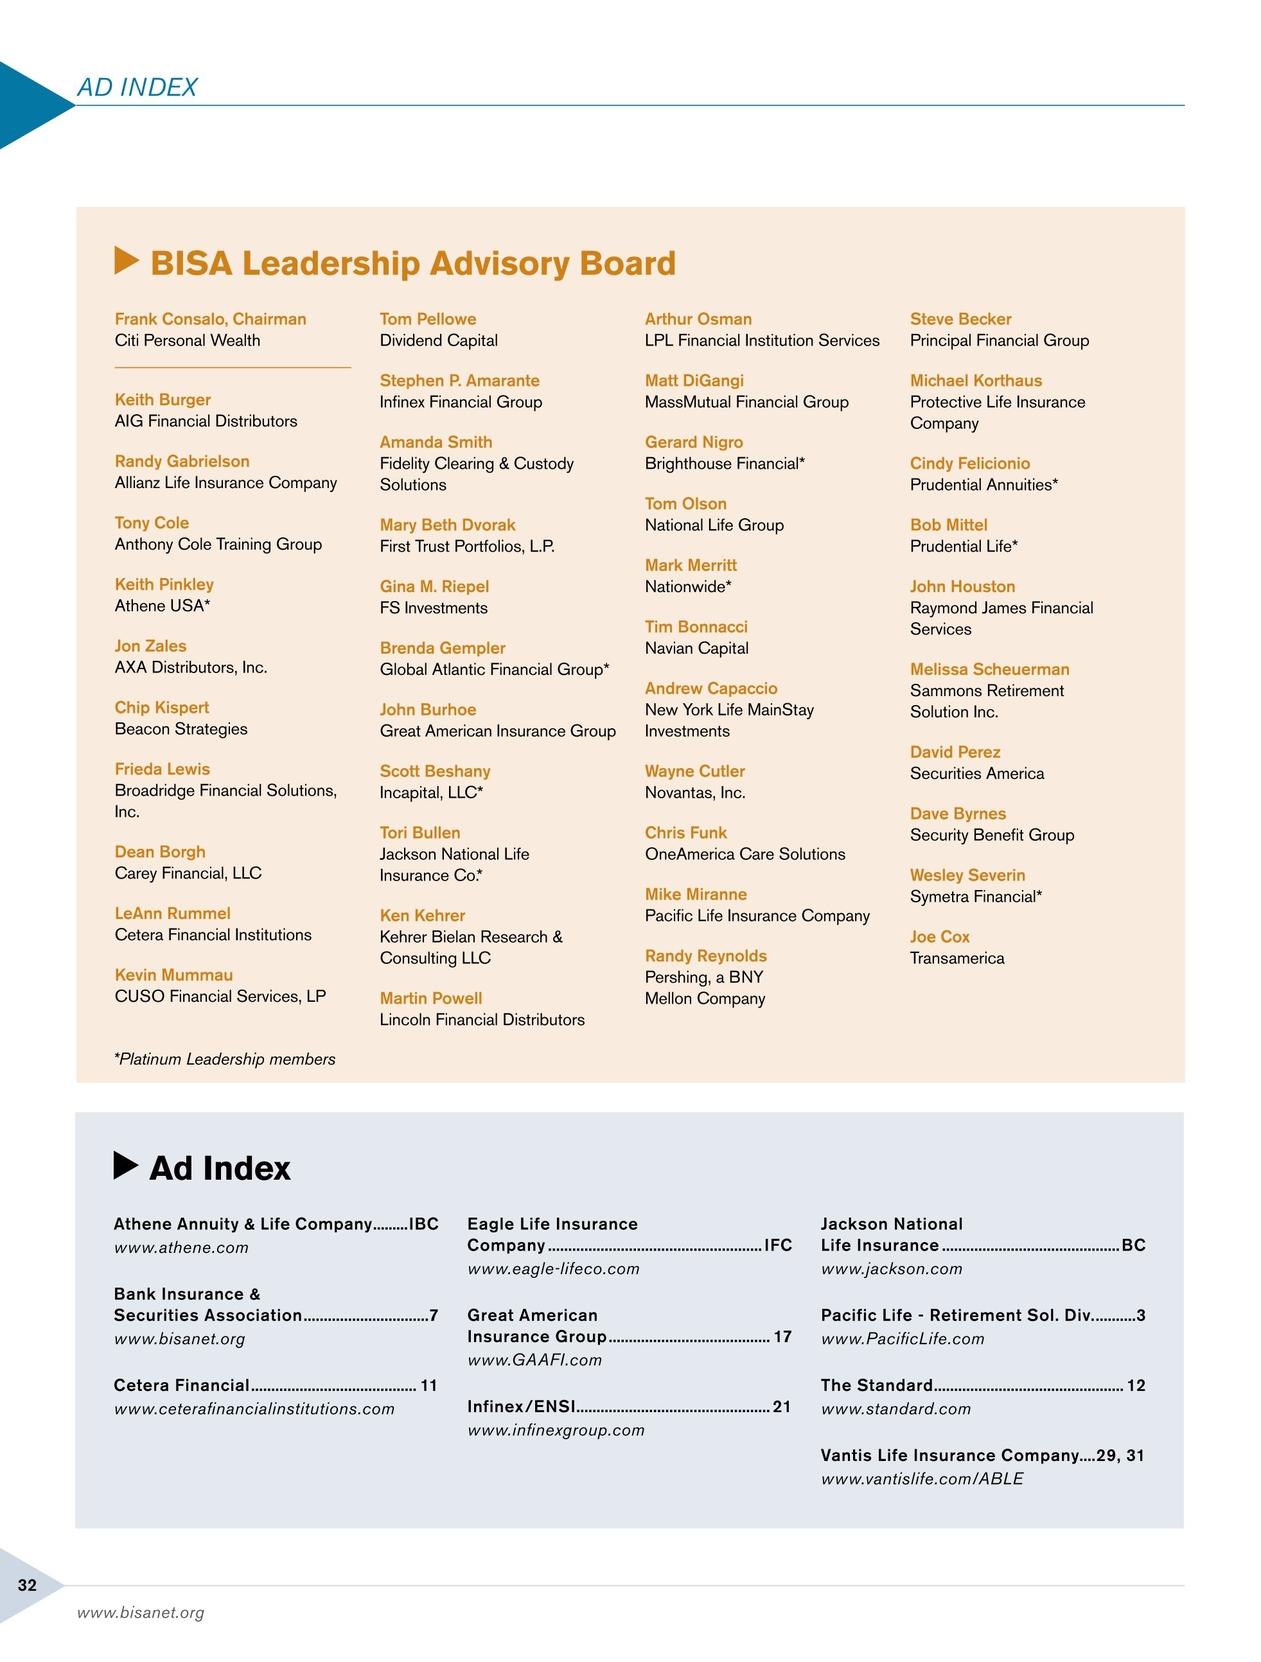 BISA Magazine - Quarter 1, 2017